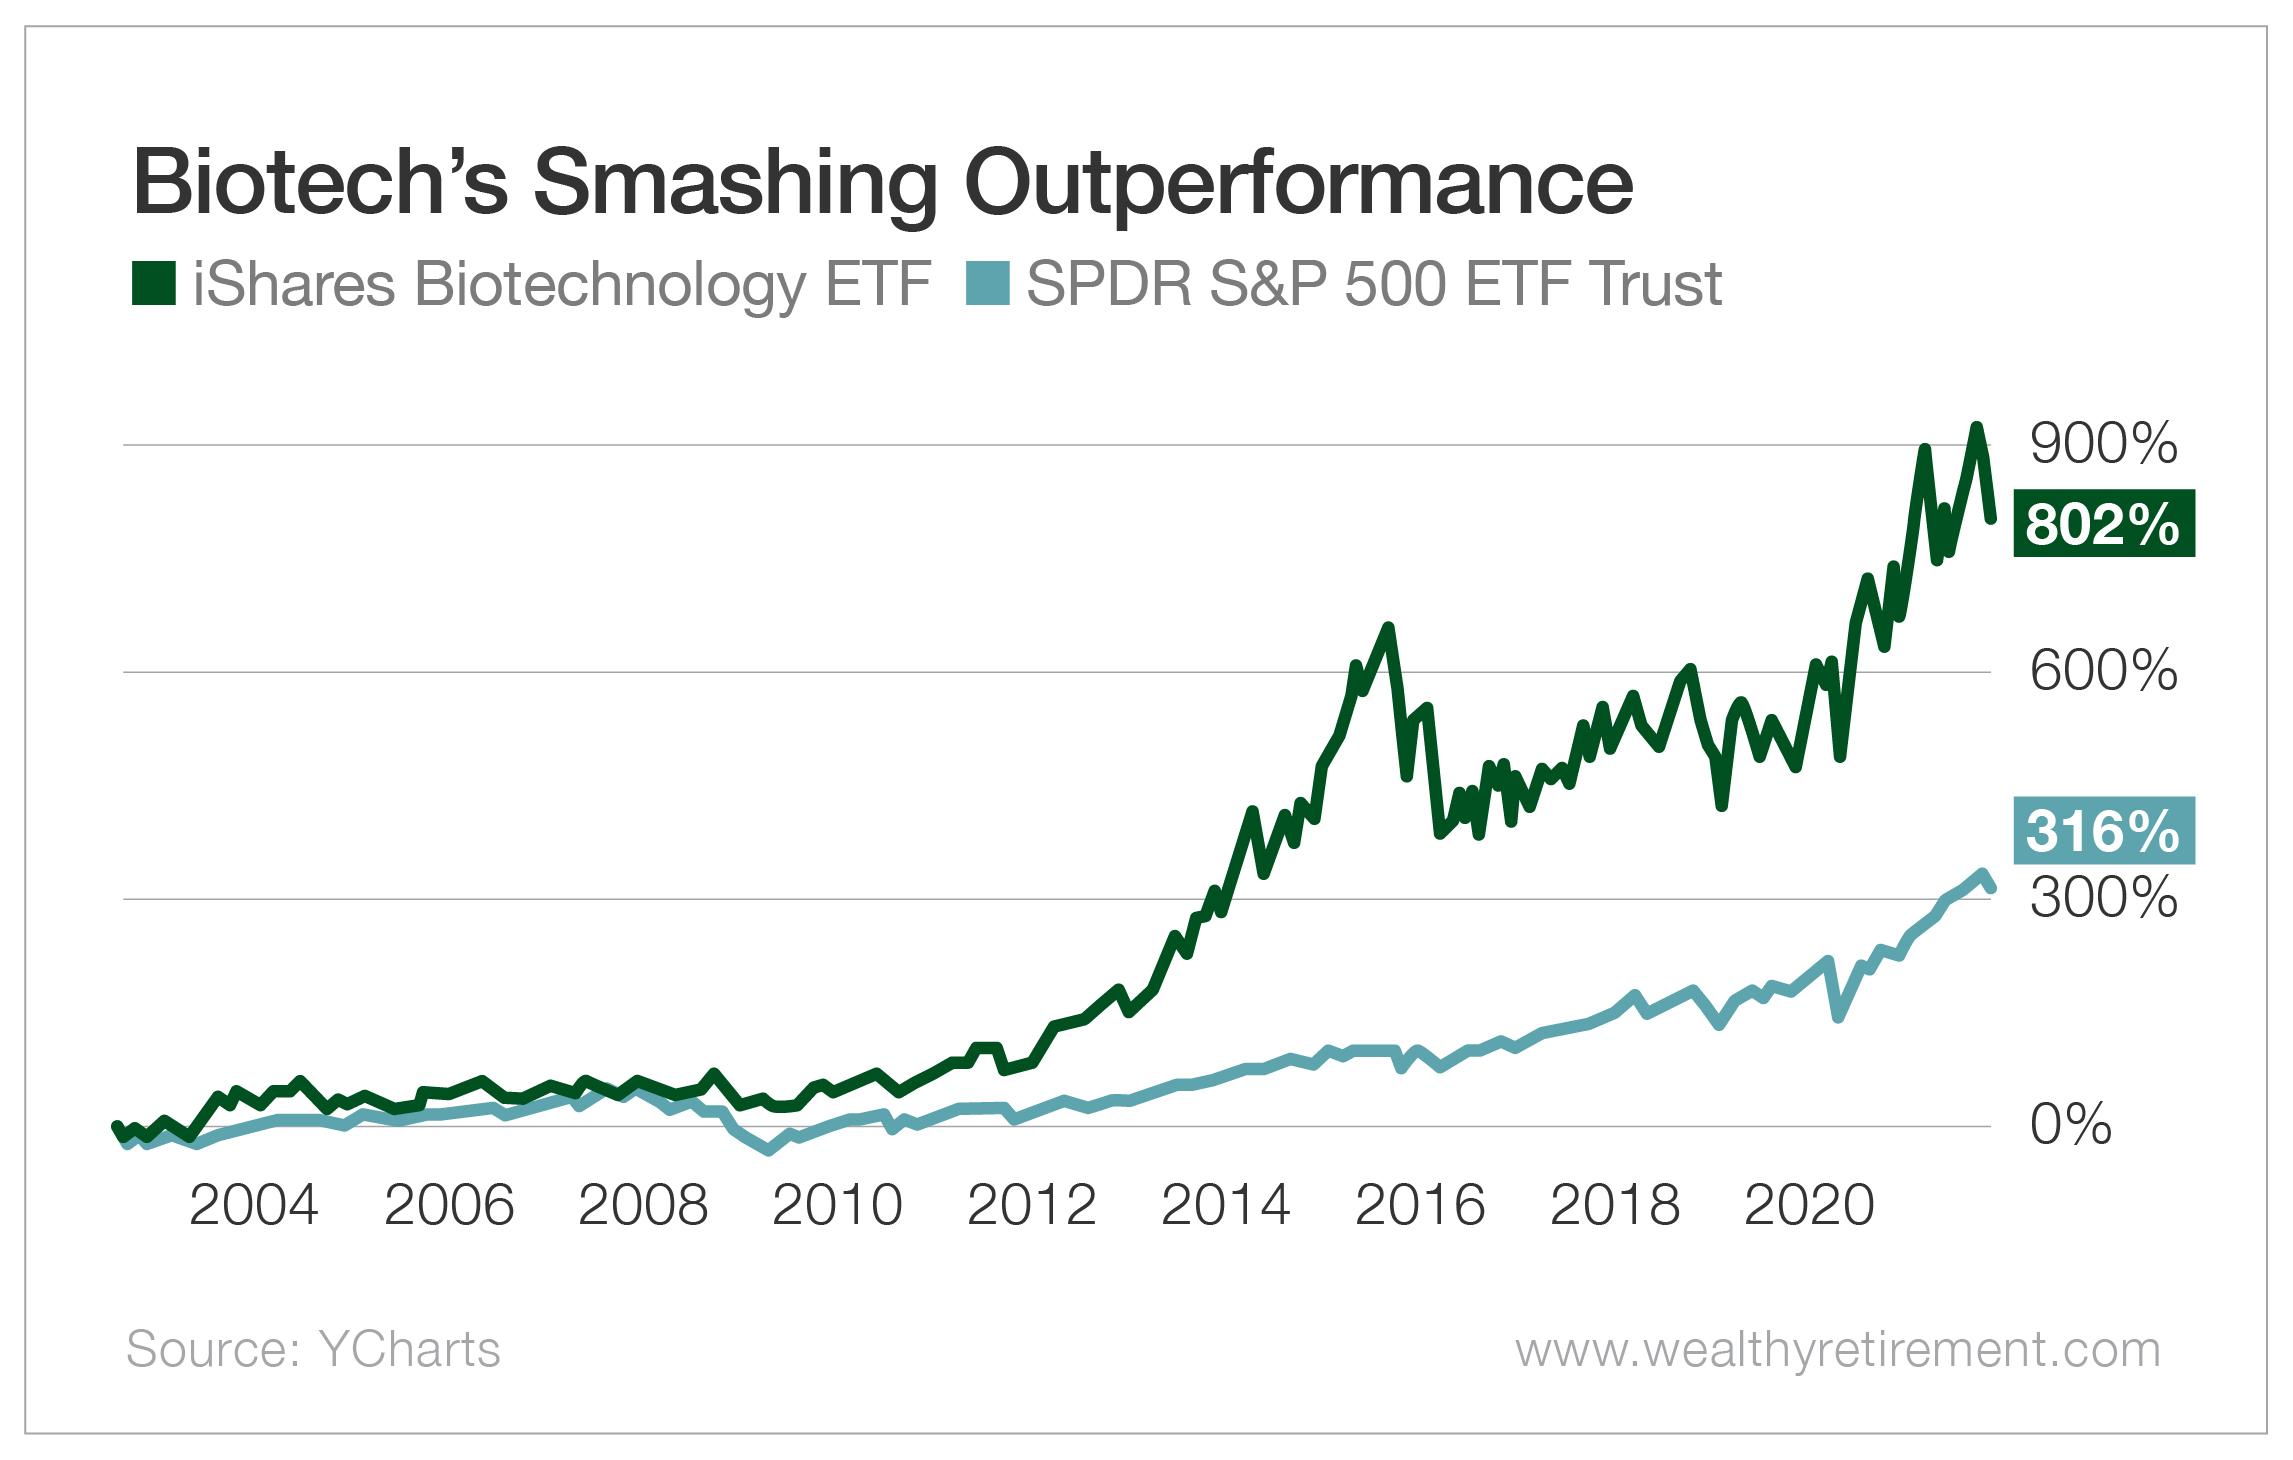 Biotech's Smashing Outperformance